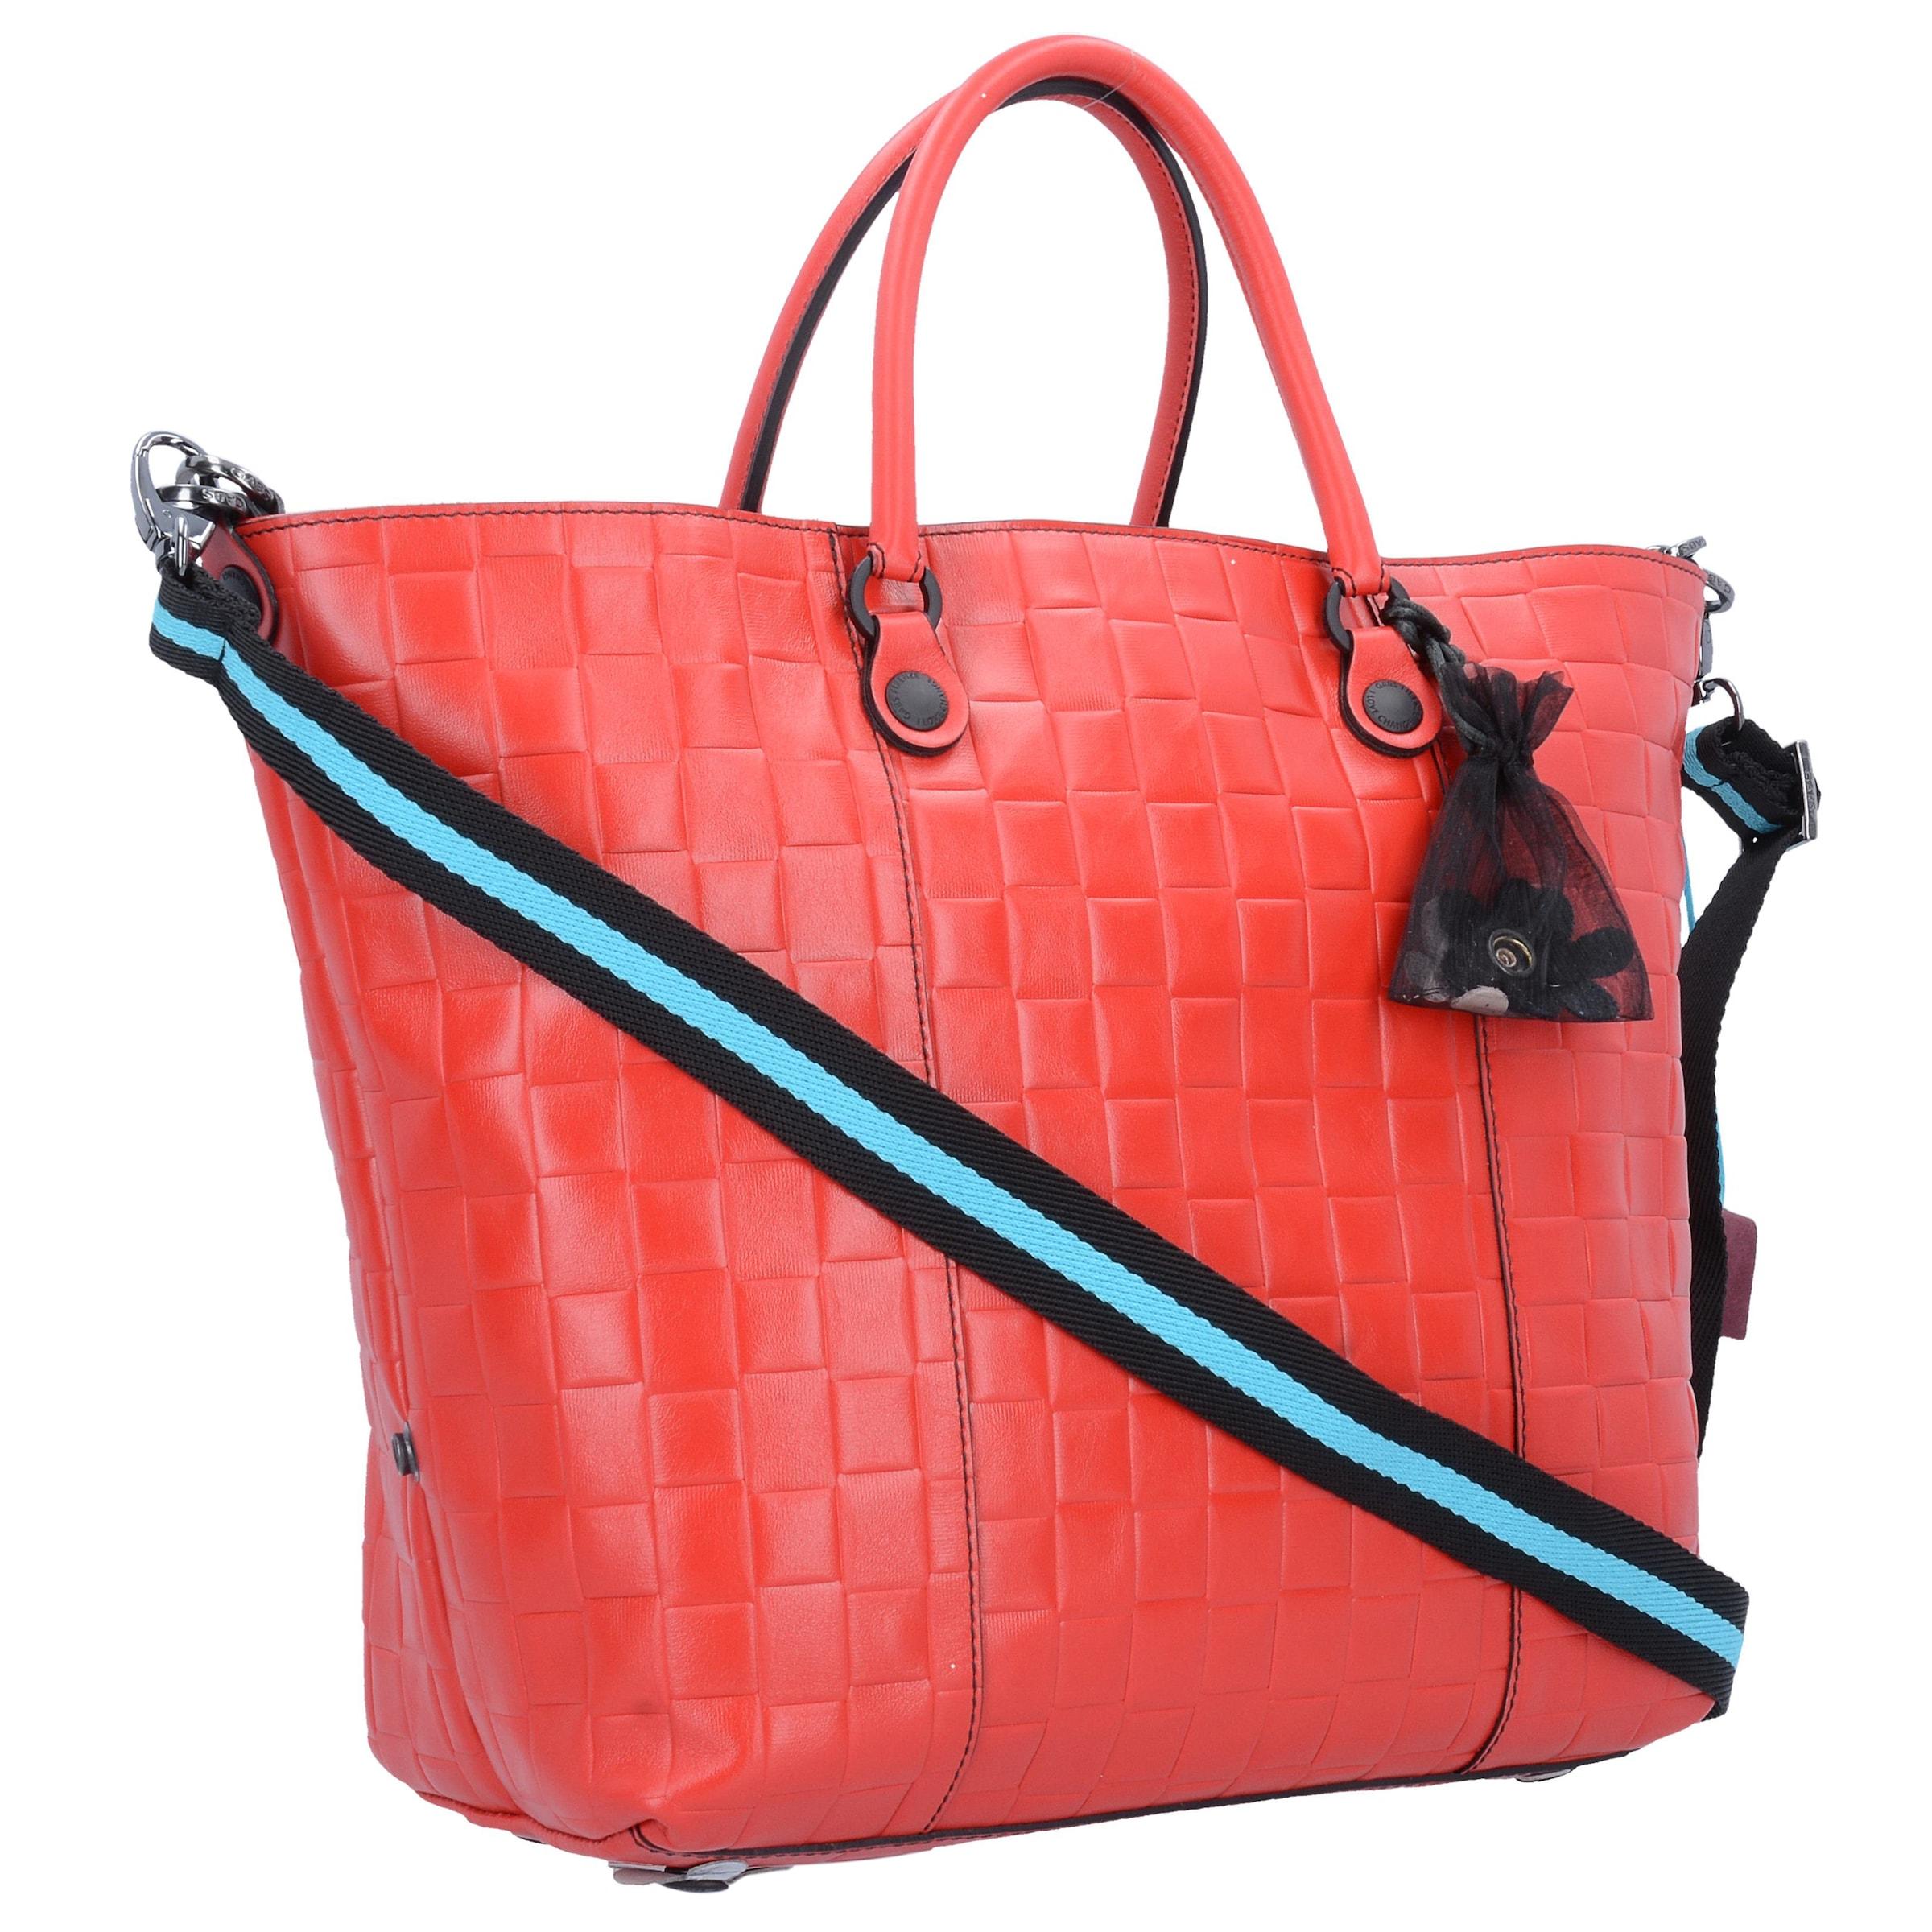 Gabs In Handtasche Handtasche Handtasche 'gshop' Melone Melone In Gabs 'gshop' Gabs I9DHE2